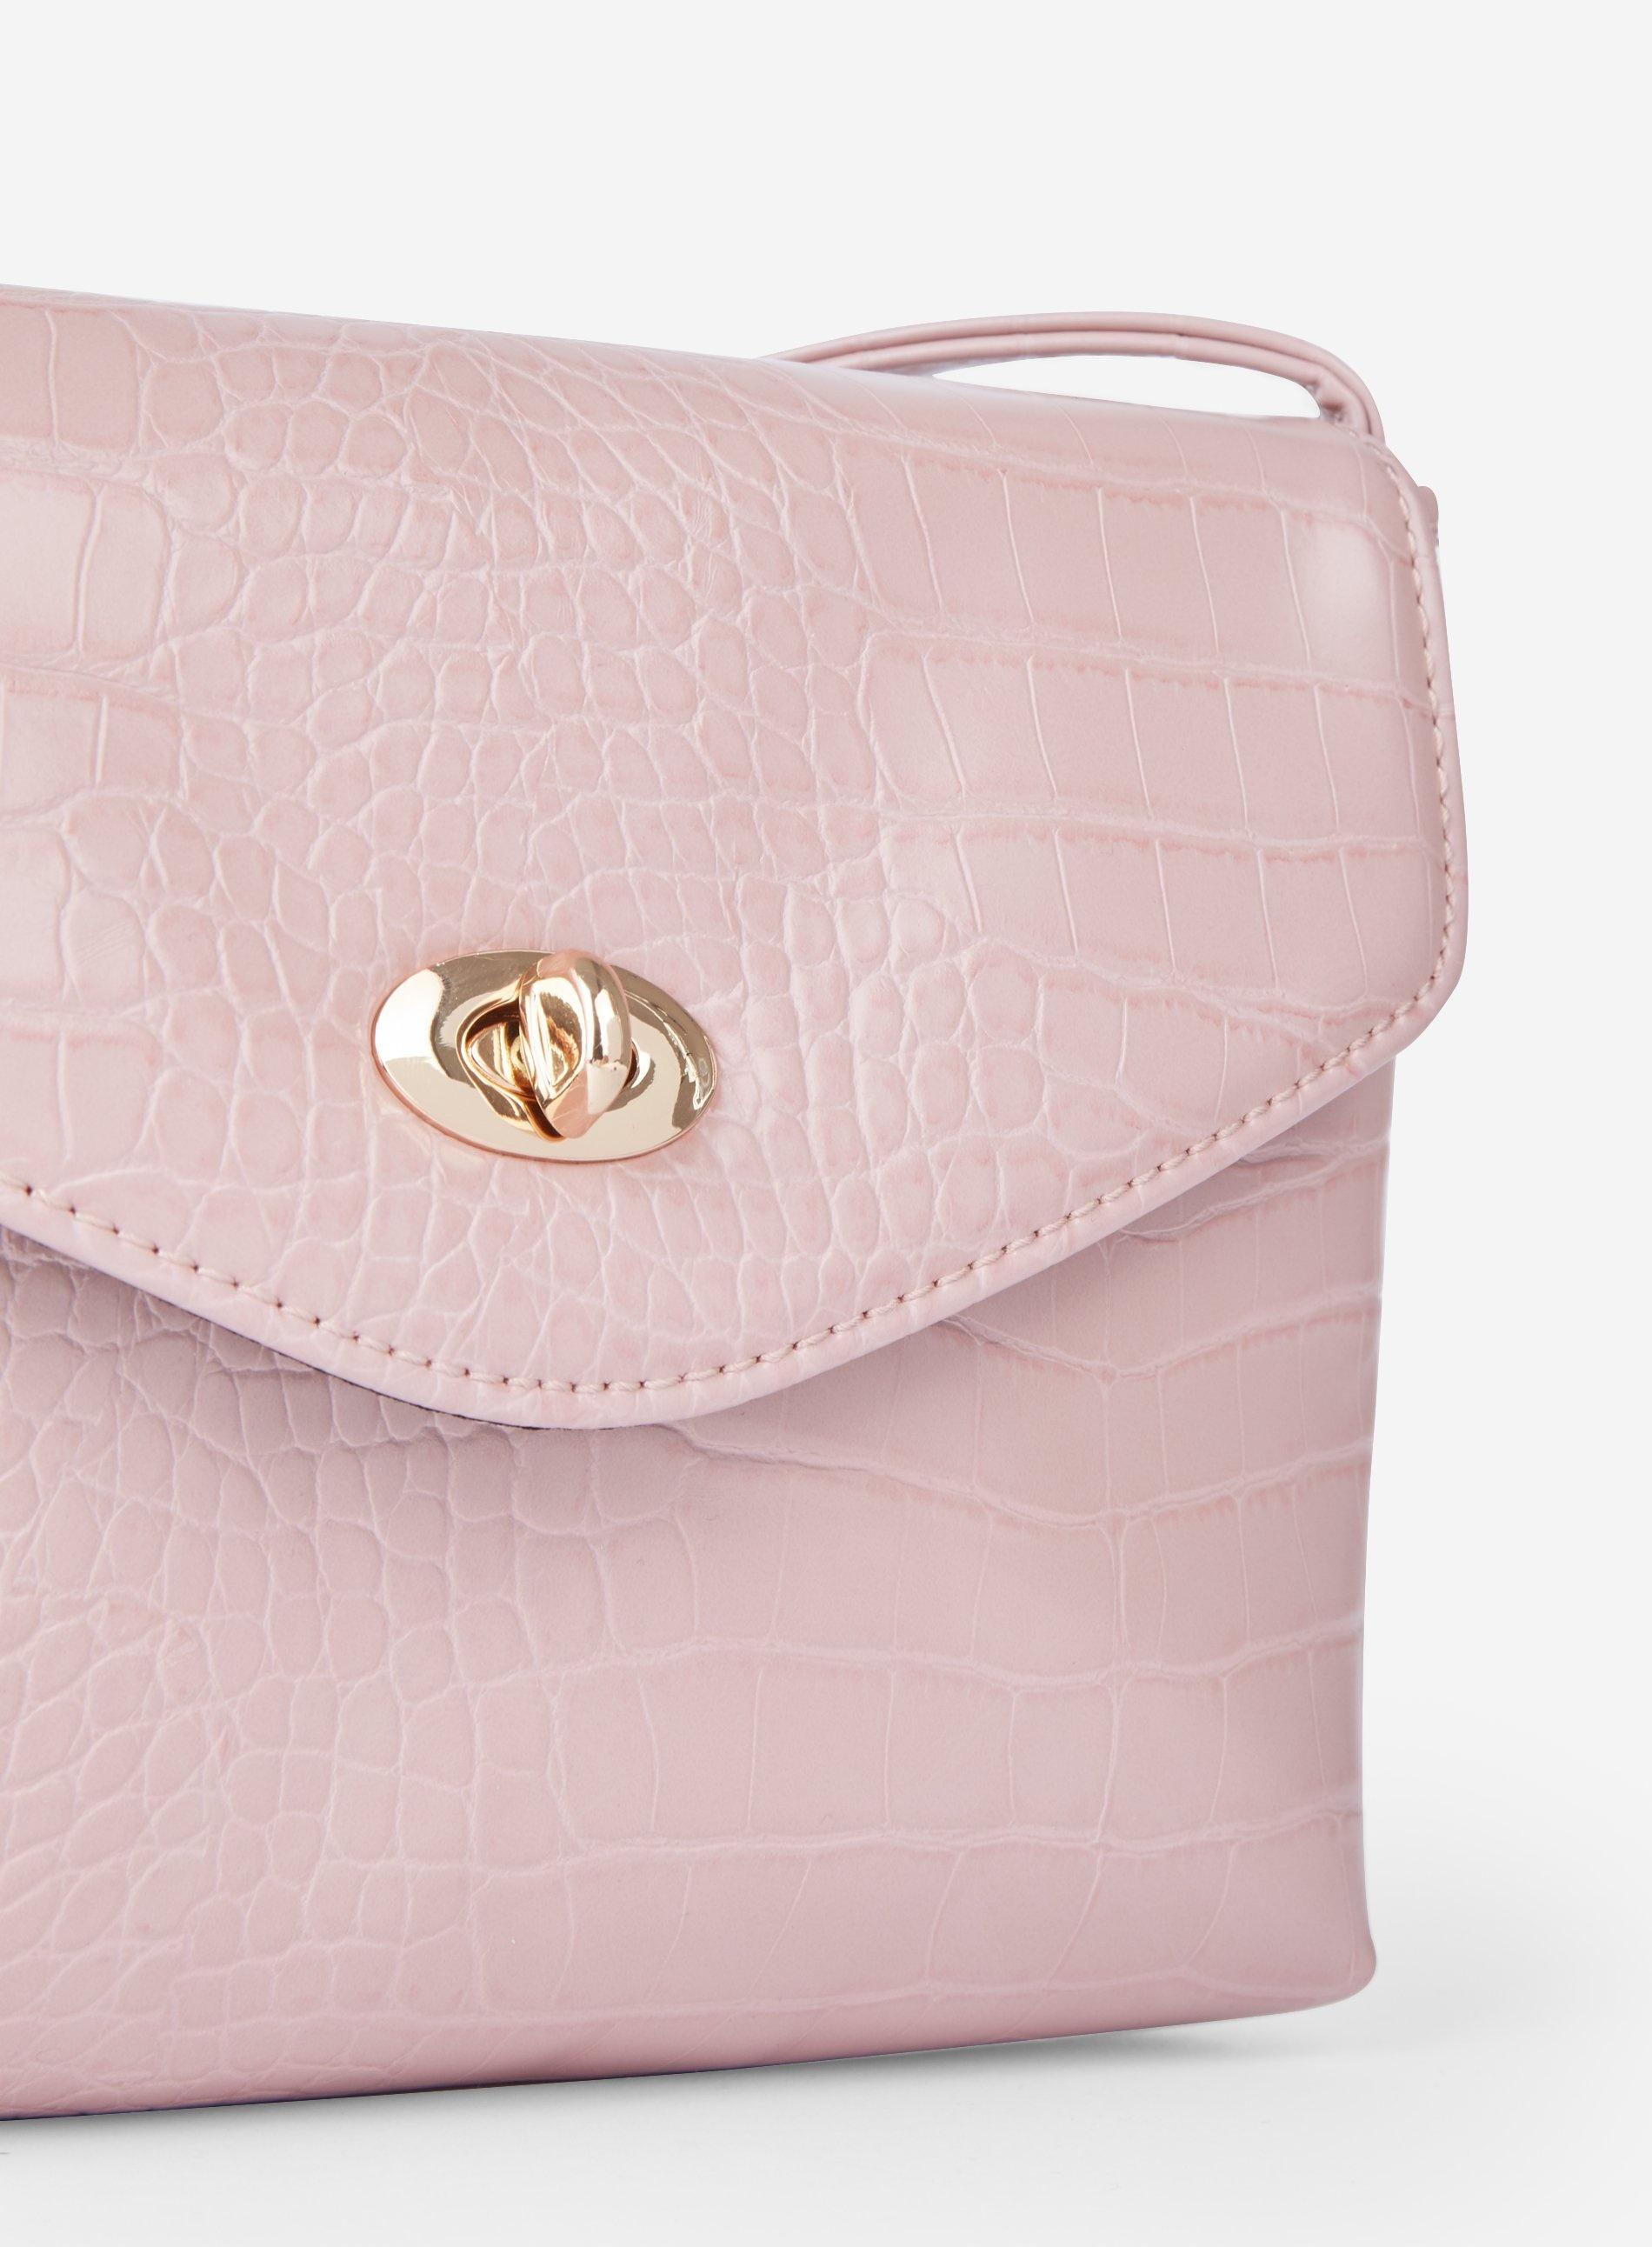 825c0cdfca1 Dorothy Perkins Blush Crocodile Design Twistlock Cross Body Bag in ...